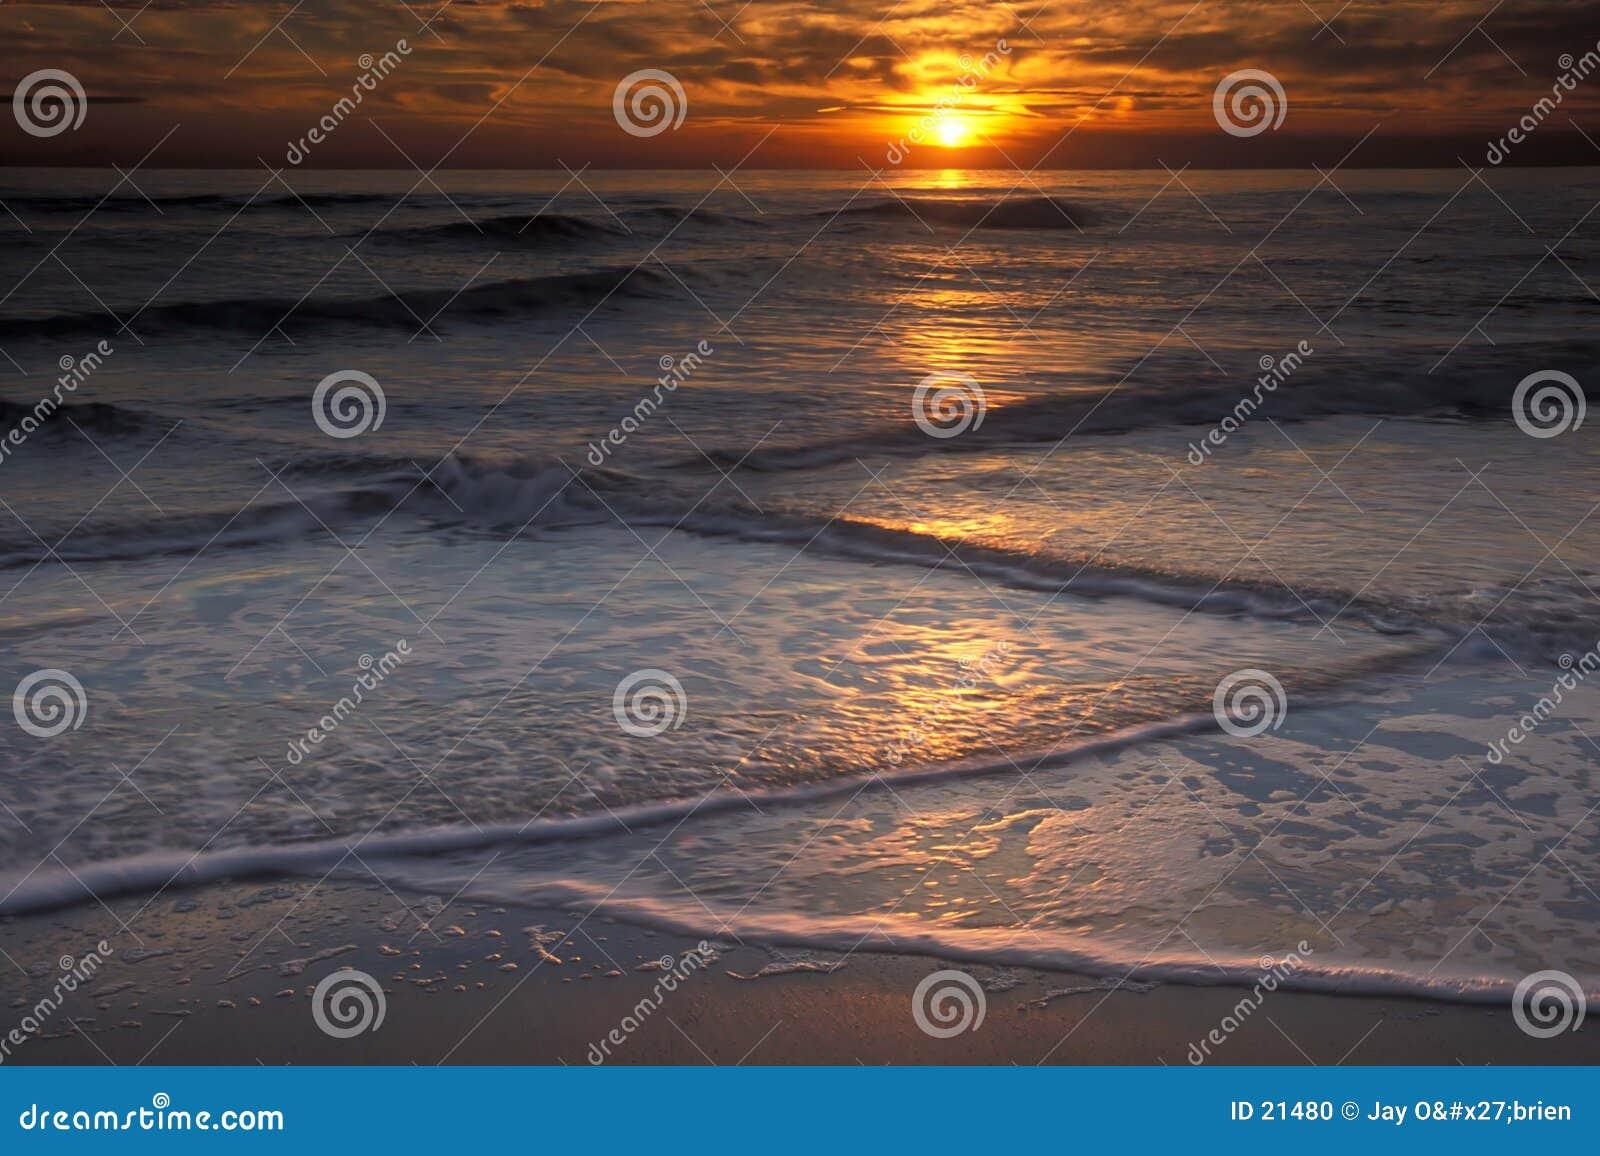 Waves & sunset